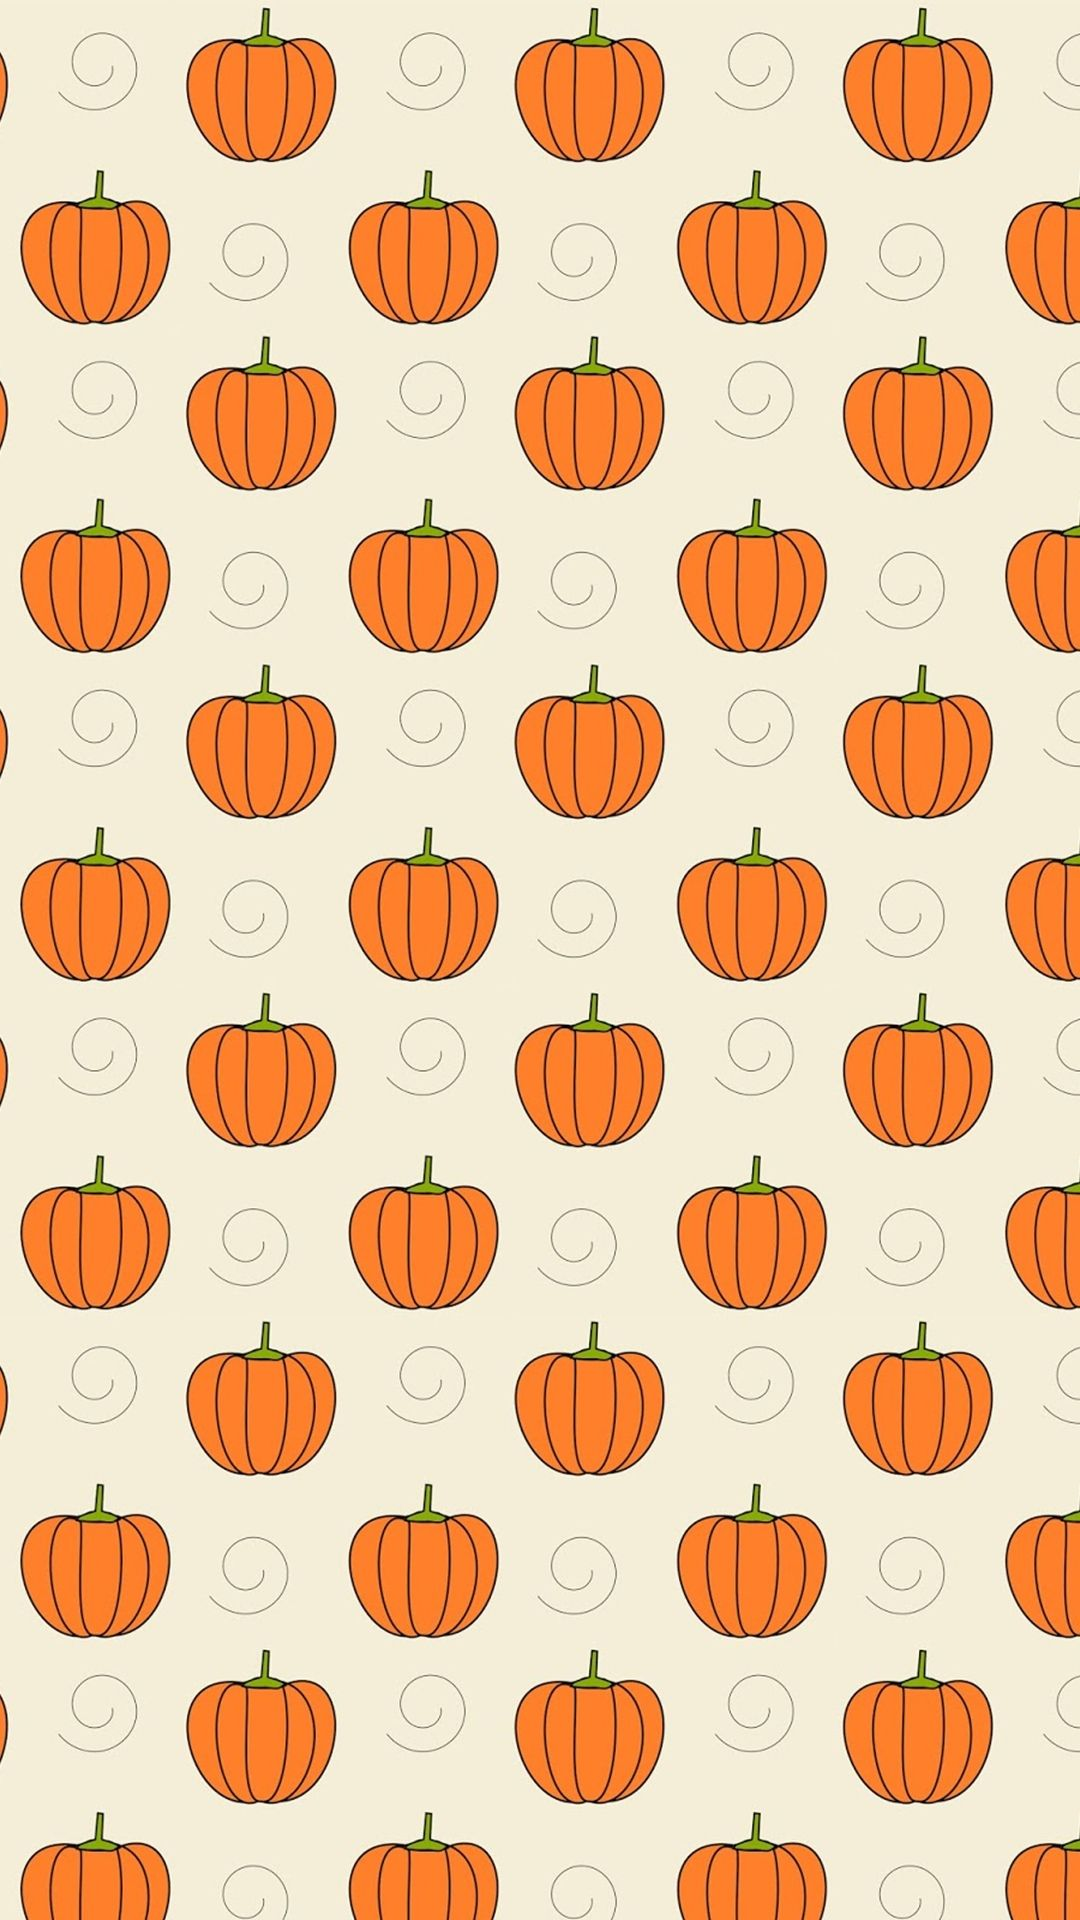 Pumpkins - Tap to see more cute halloween wallpaper! | @mobile9 ...